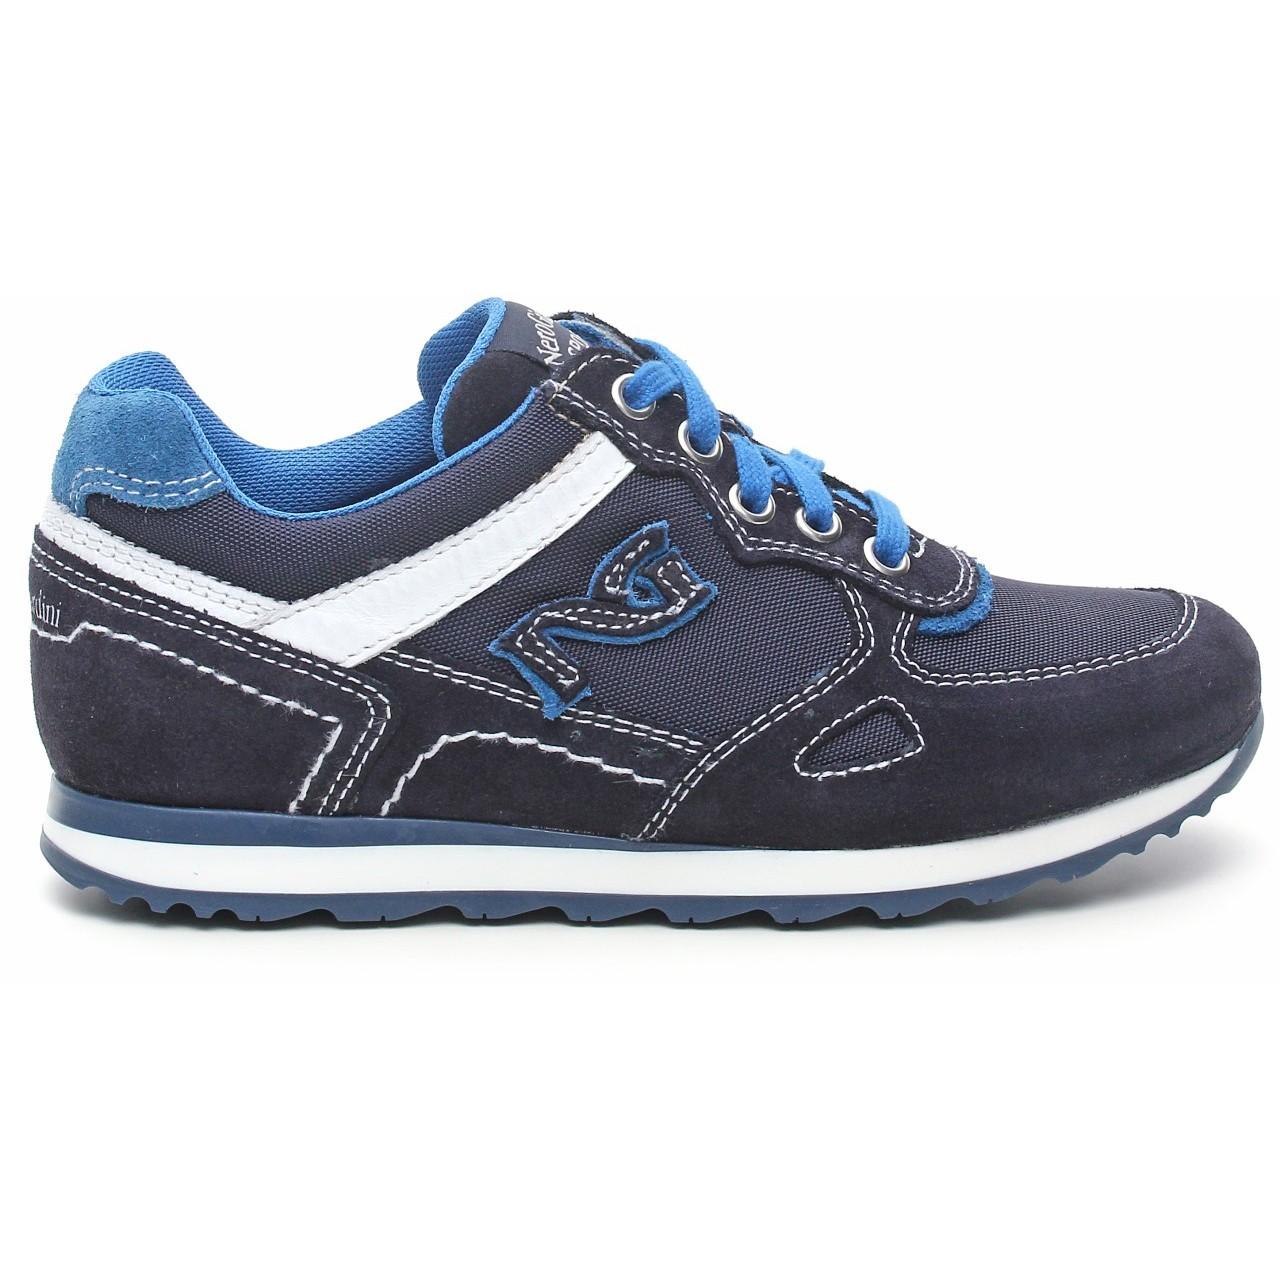 Nero giardini junior sneaker ragazzo camoscio tela - Scarpe nero giardini bambino ...